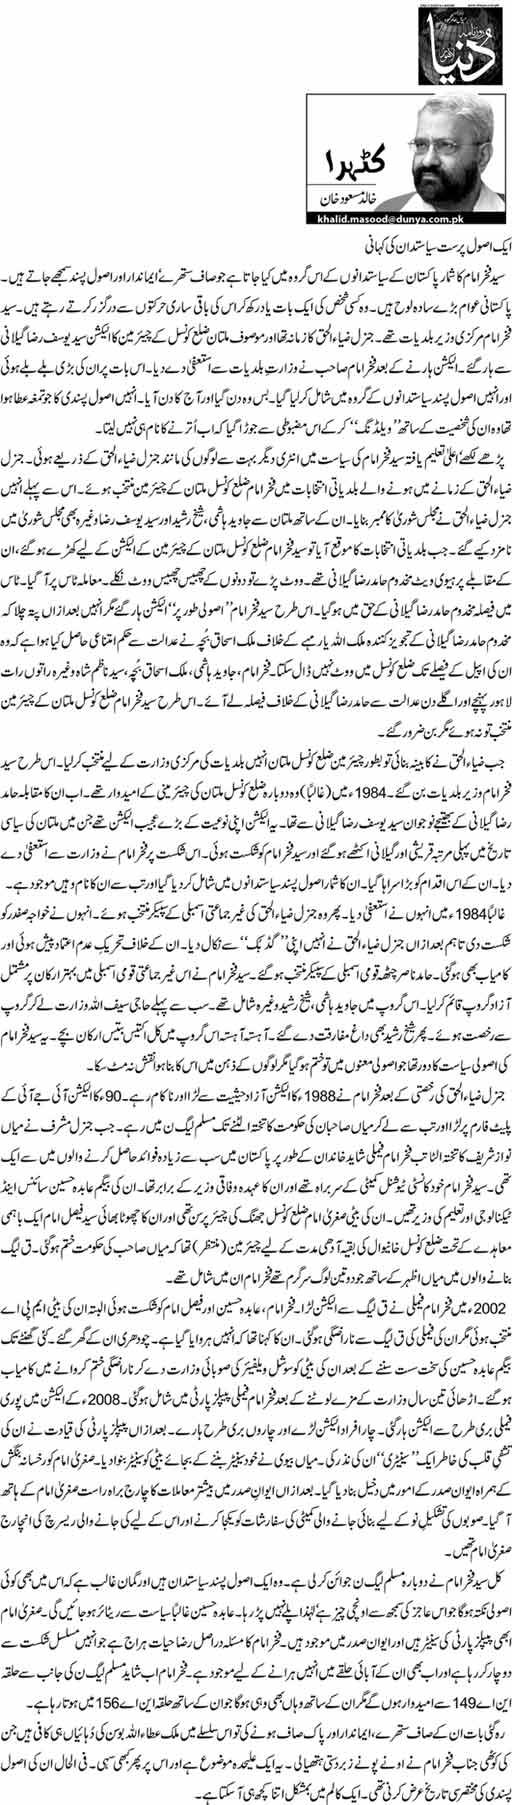 Aik Usool Parast Siyasatdaan Ki Kahani - Khalid Masood Khan